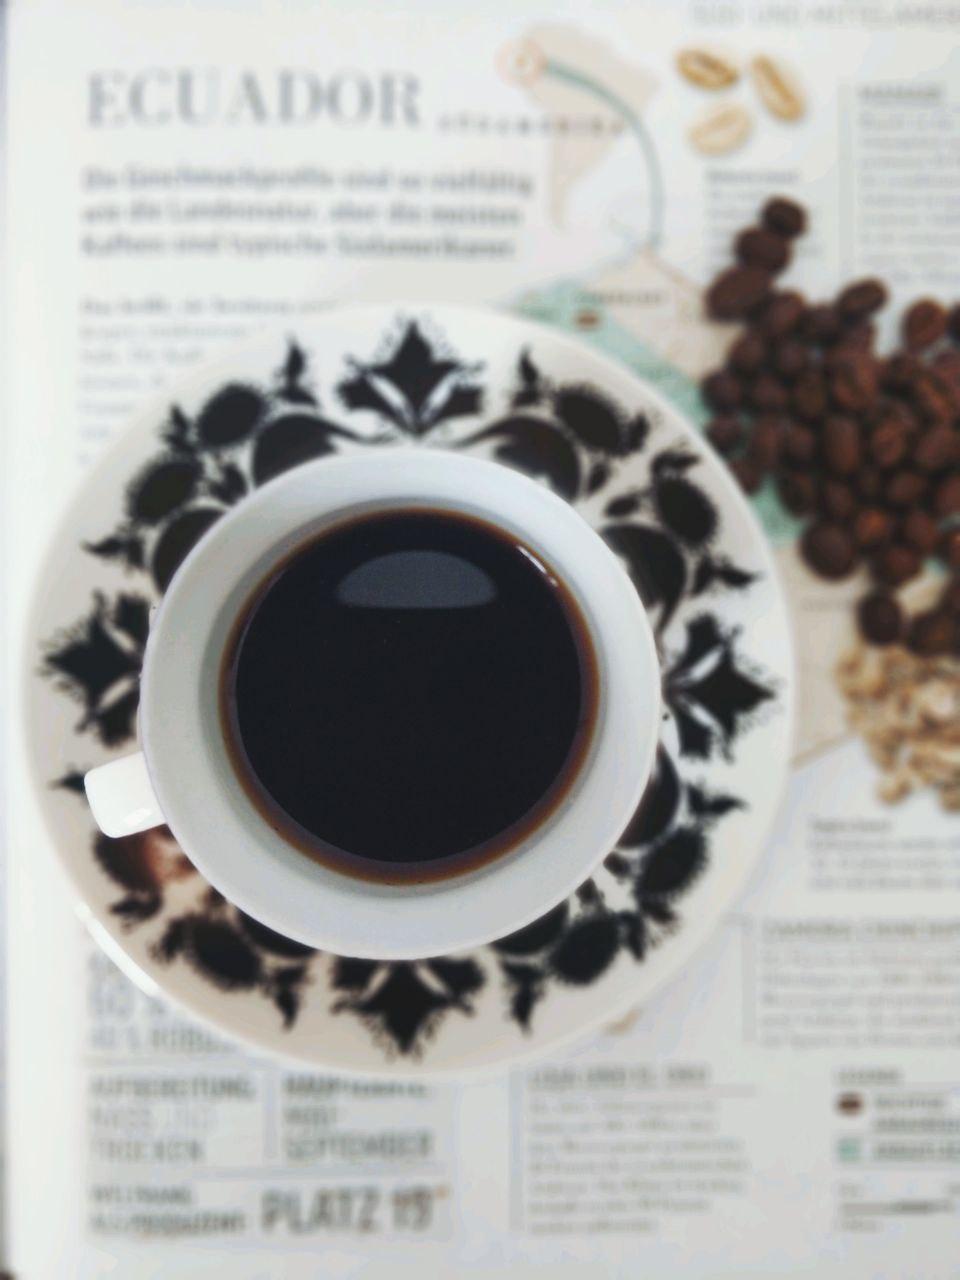 Wohnsinn-Kolumne: Das Kaffeehaus